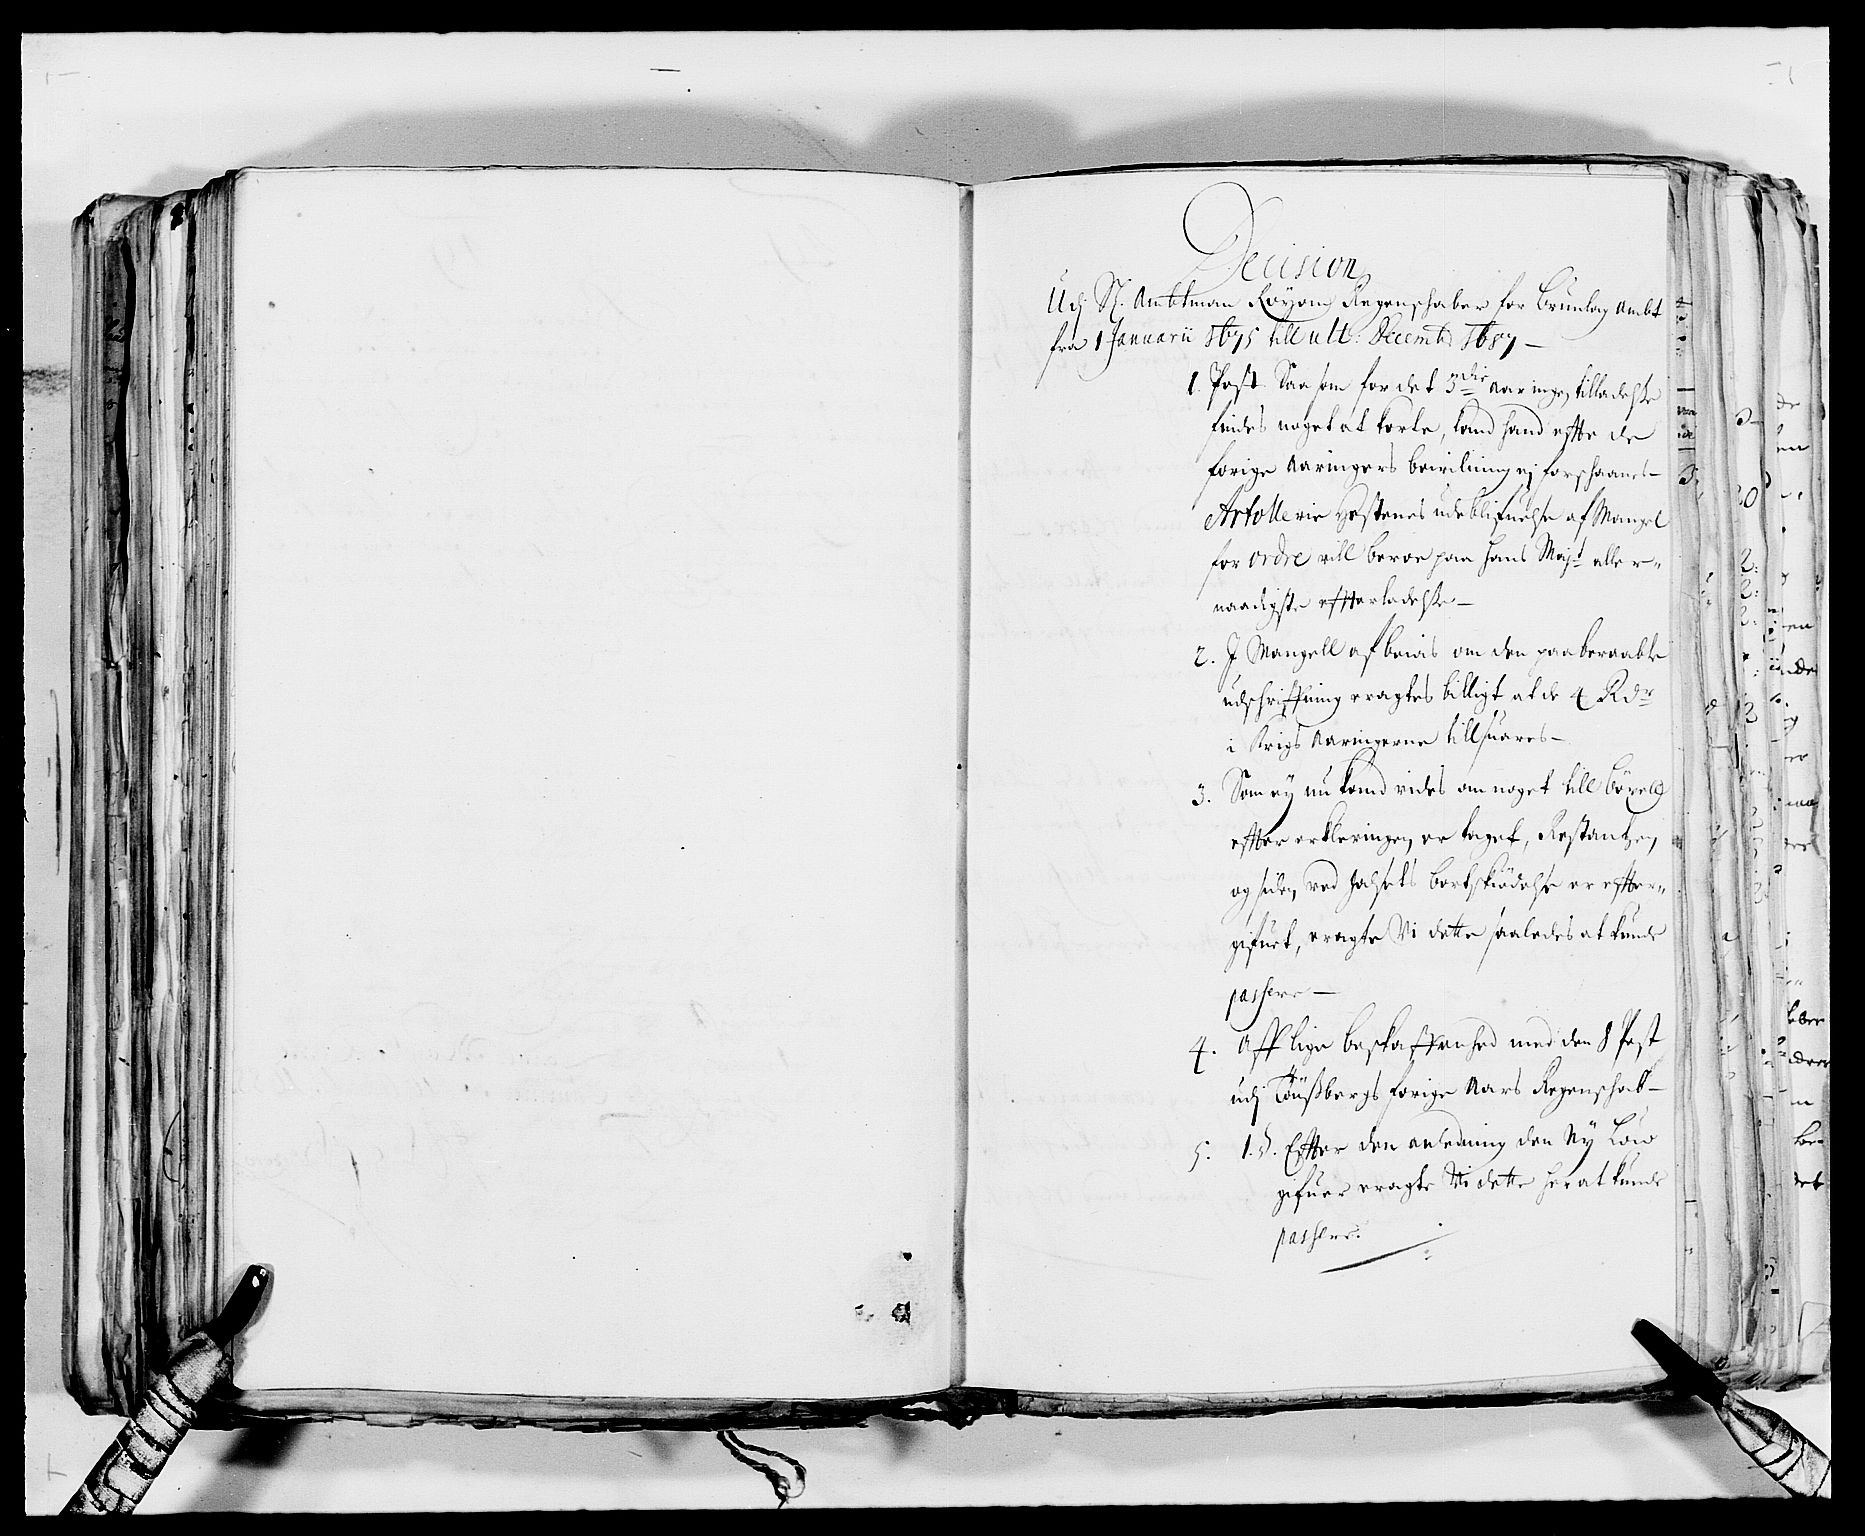 RA, Rentekammeret inntil 1814, Reviderte regnskaper, Fogderegnskap, R32/L1863: Fogderegnskap Jarlsberg grevskap, 1659-1687, s. 181